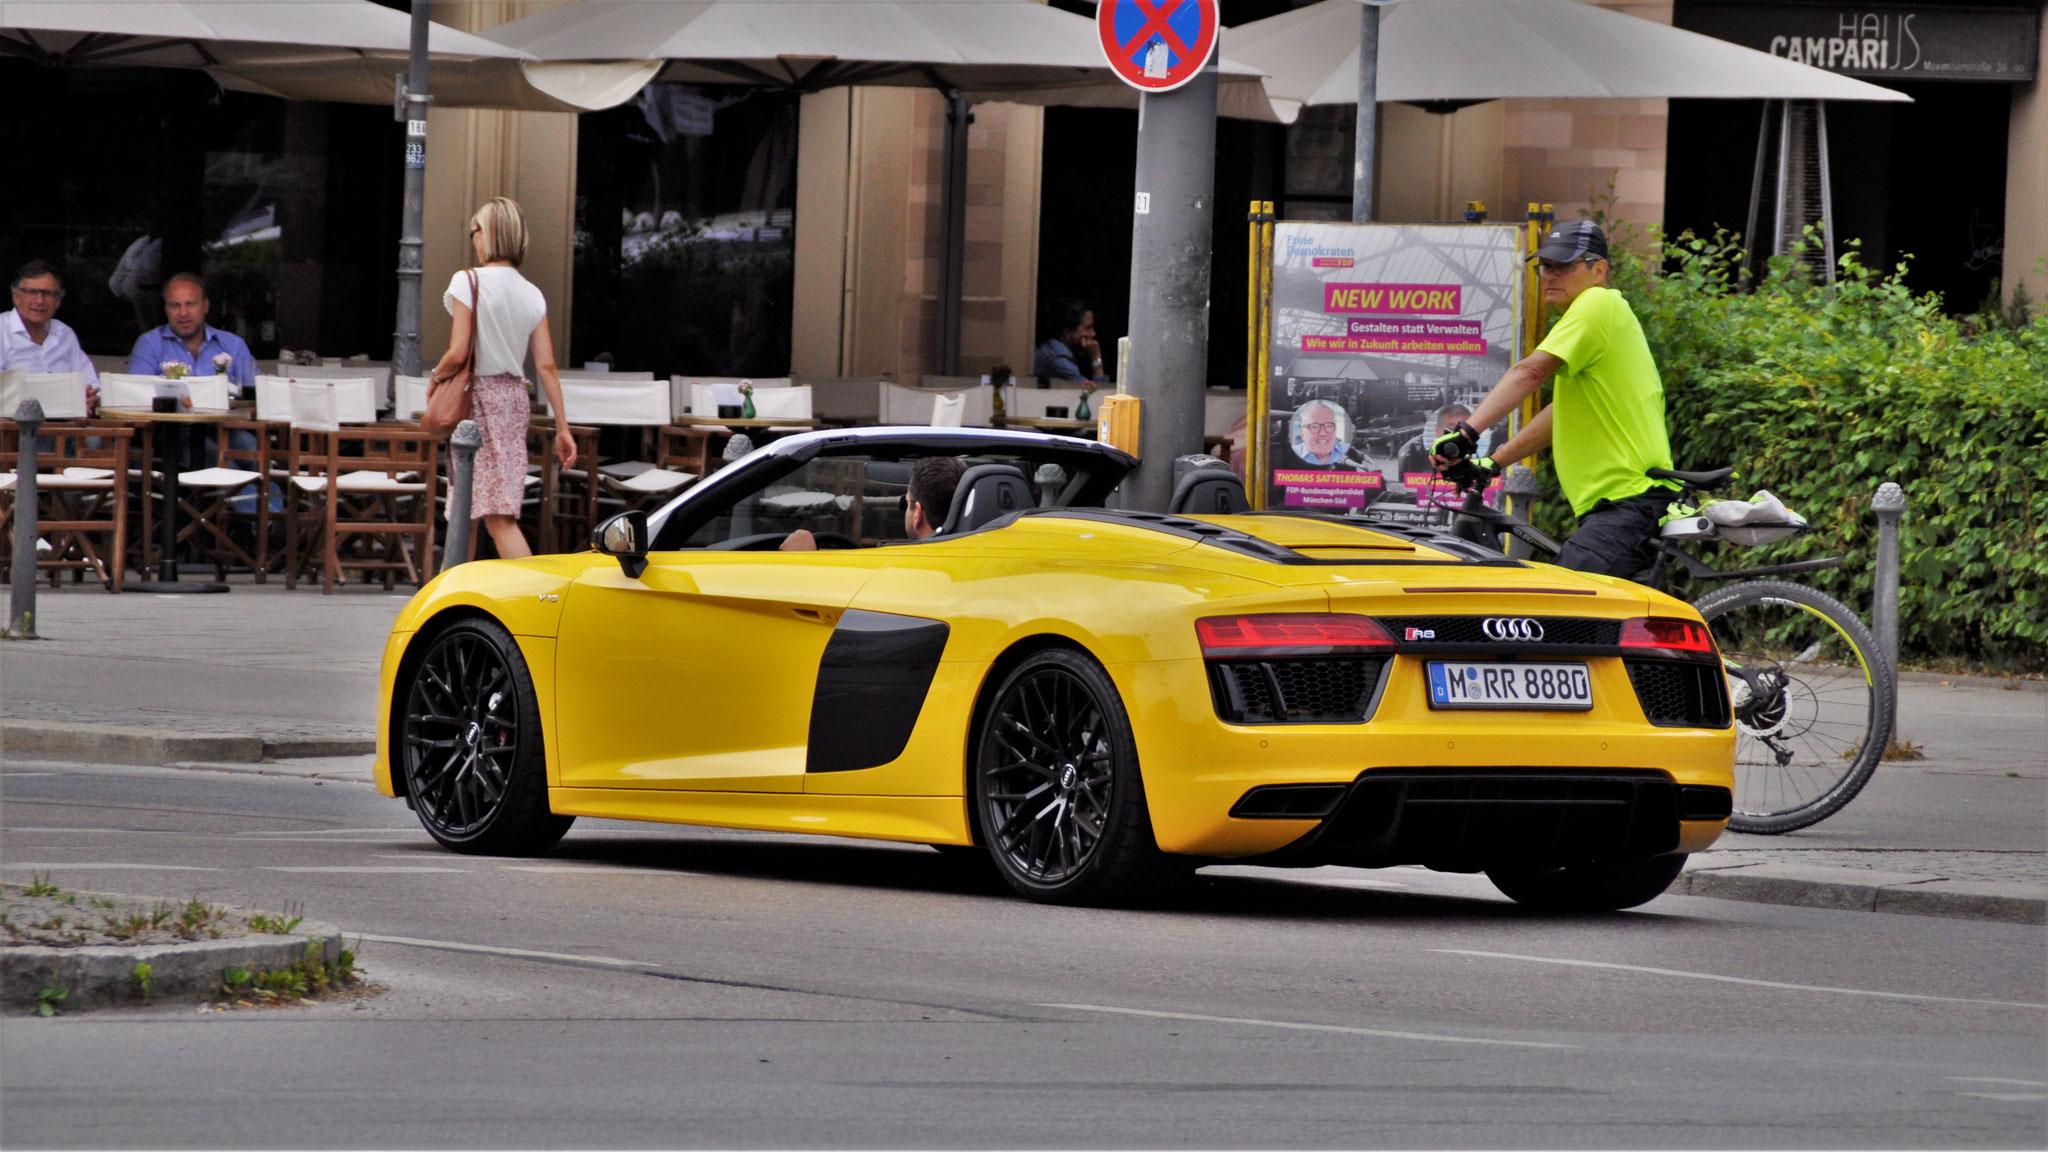 Audi R8 V10 Spyder - M-RR-8880